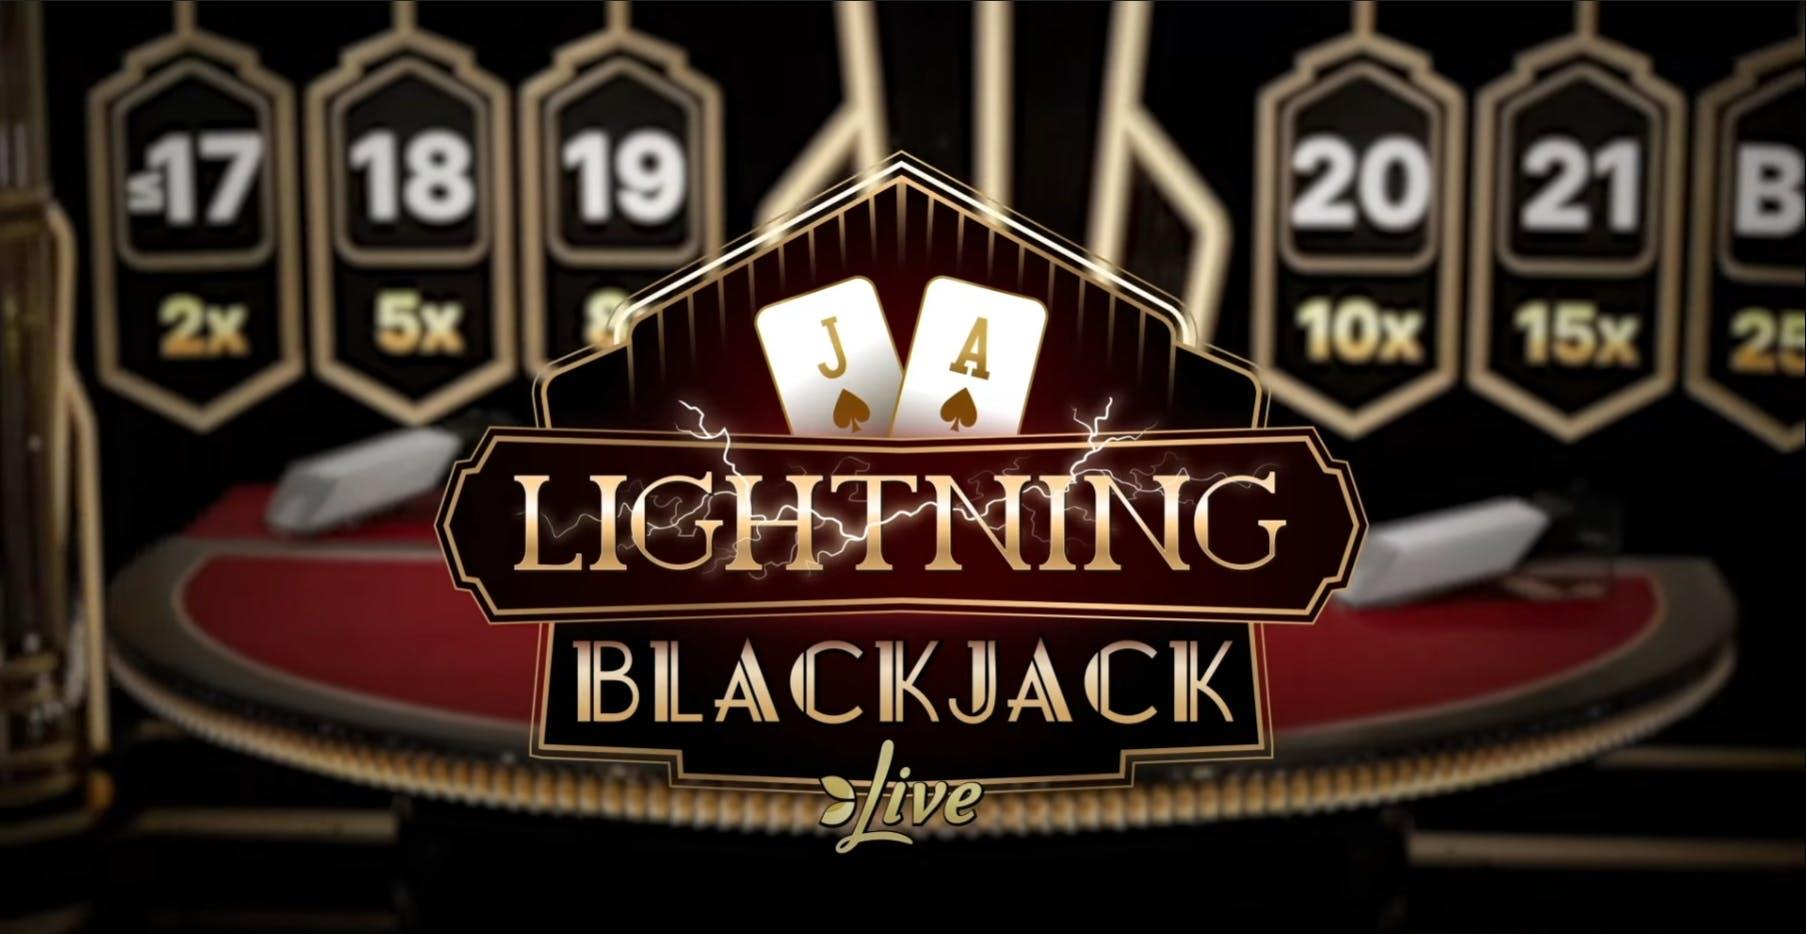 lightning blackjack high definition HD banner advertising